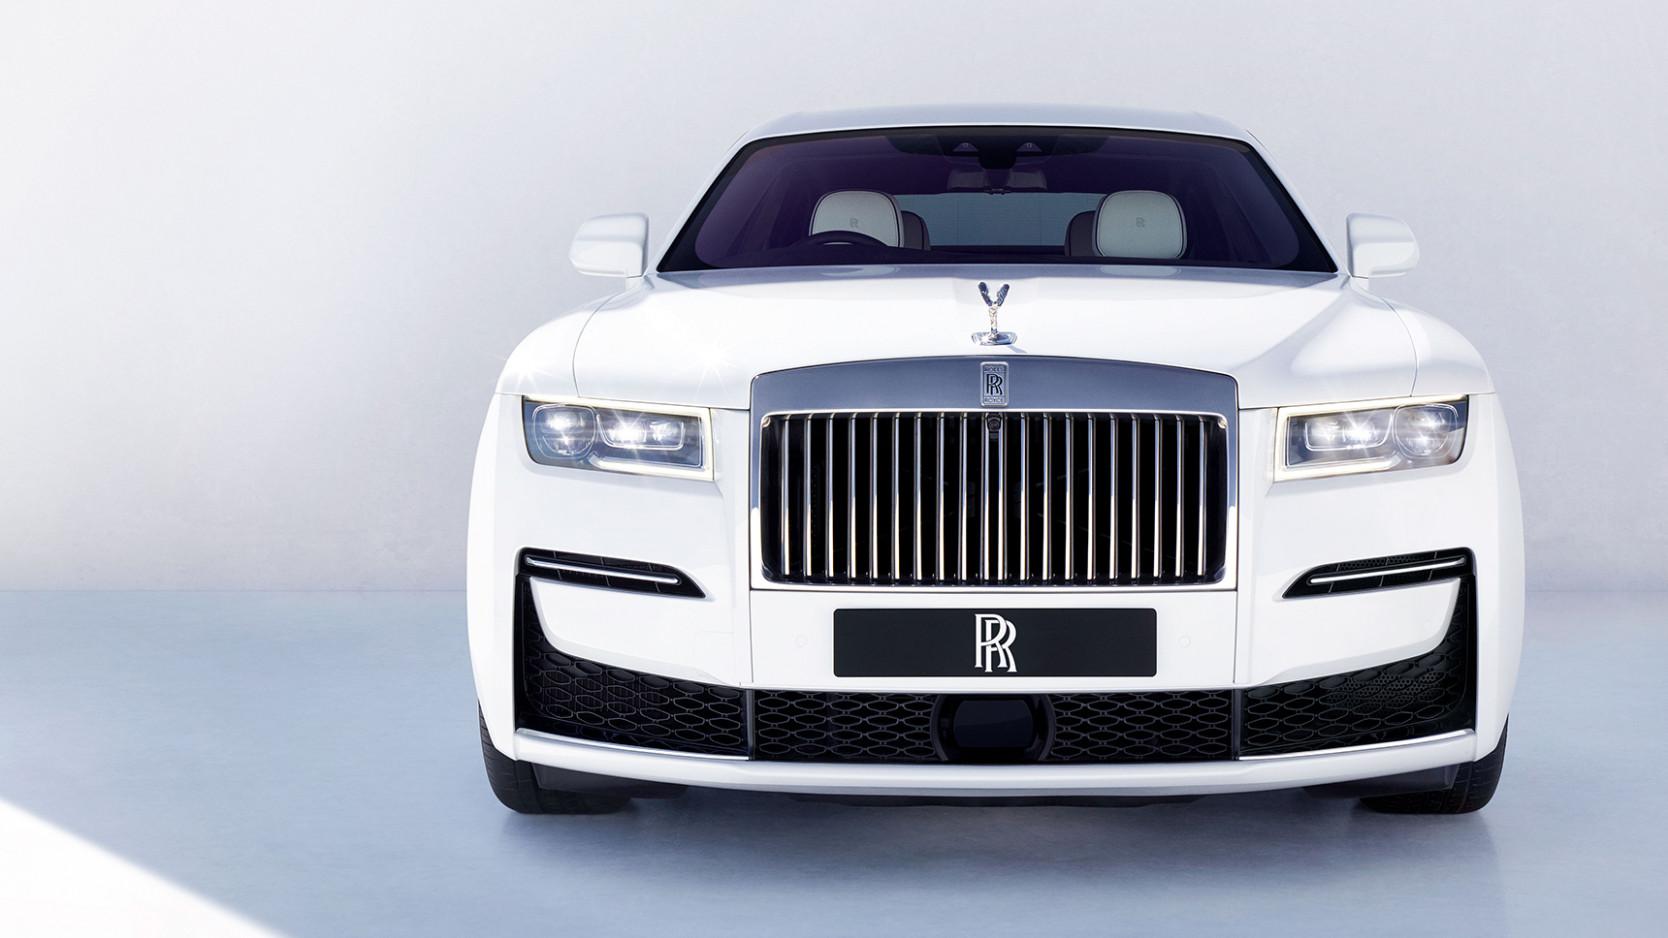 Performance 2022 Rolls Royce Phantoms